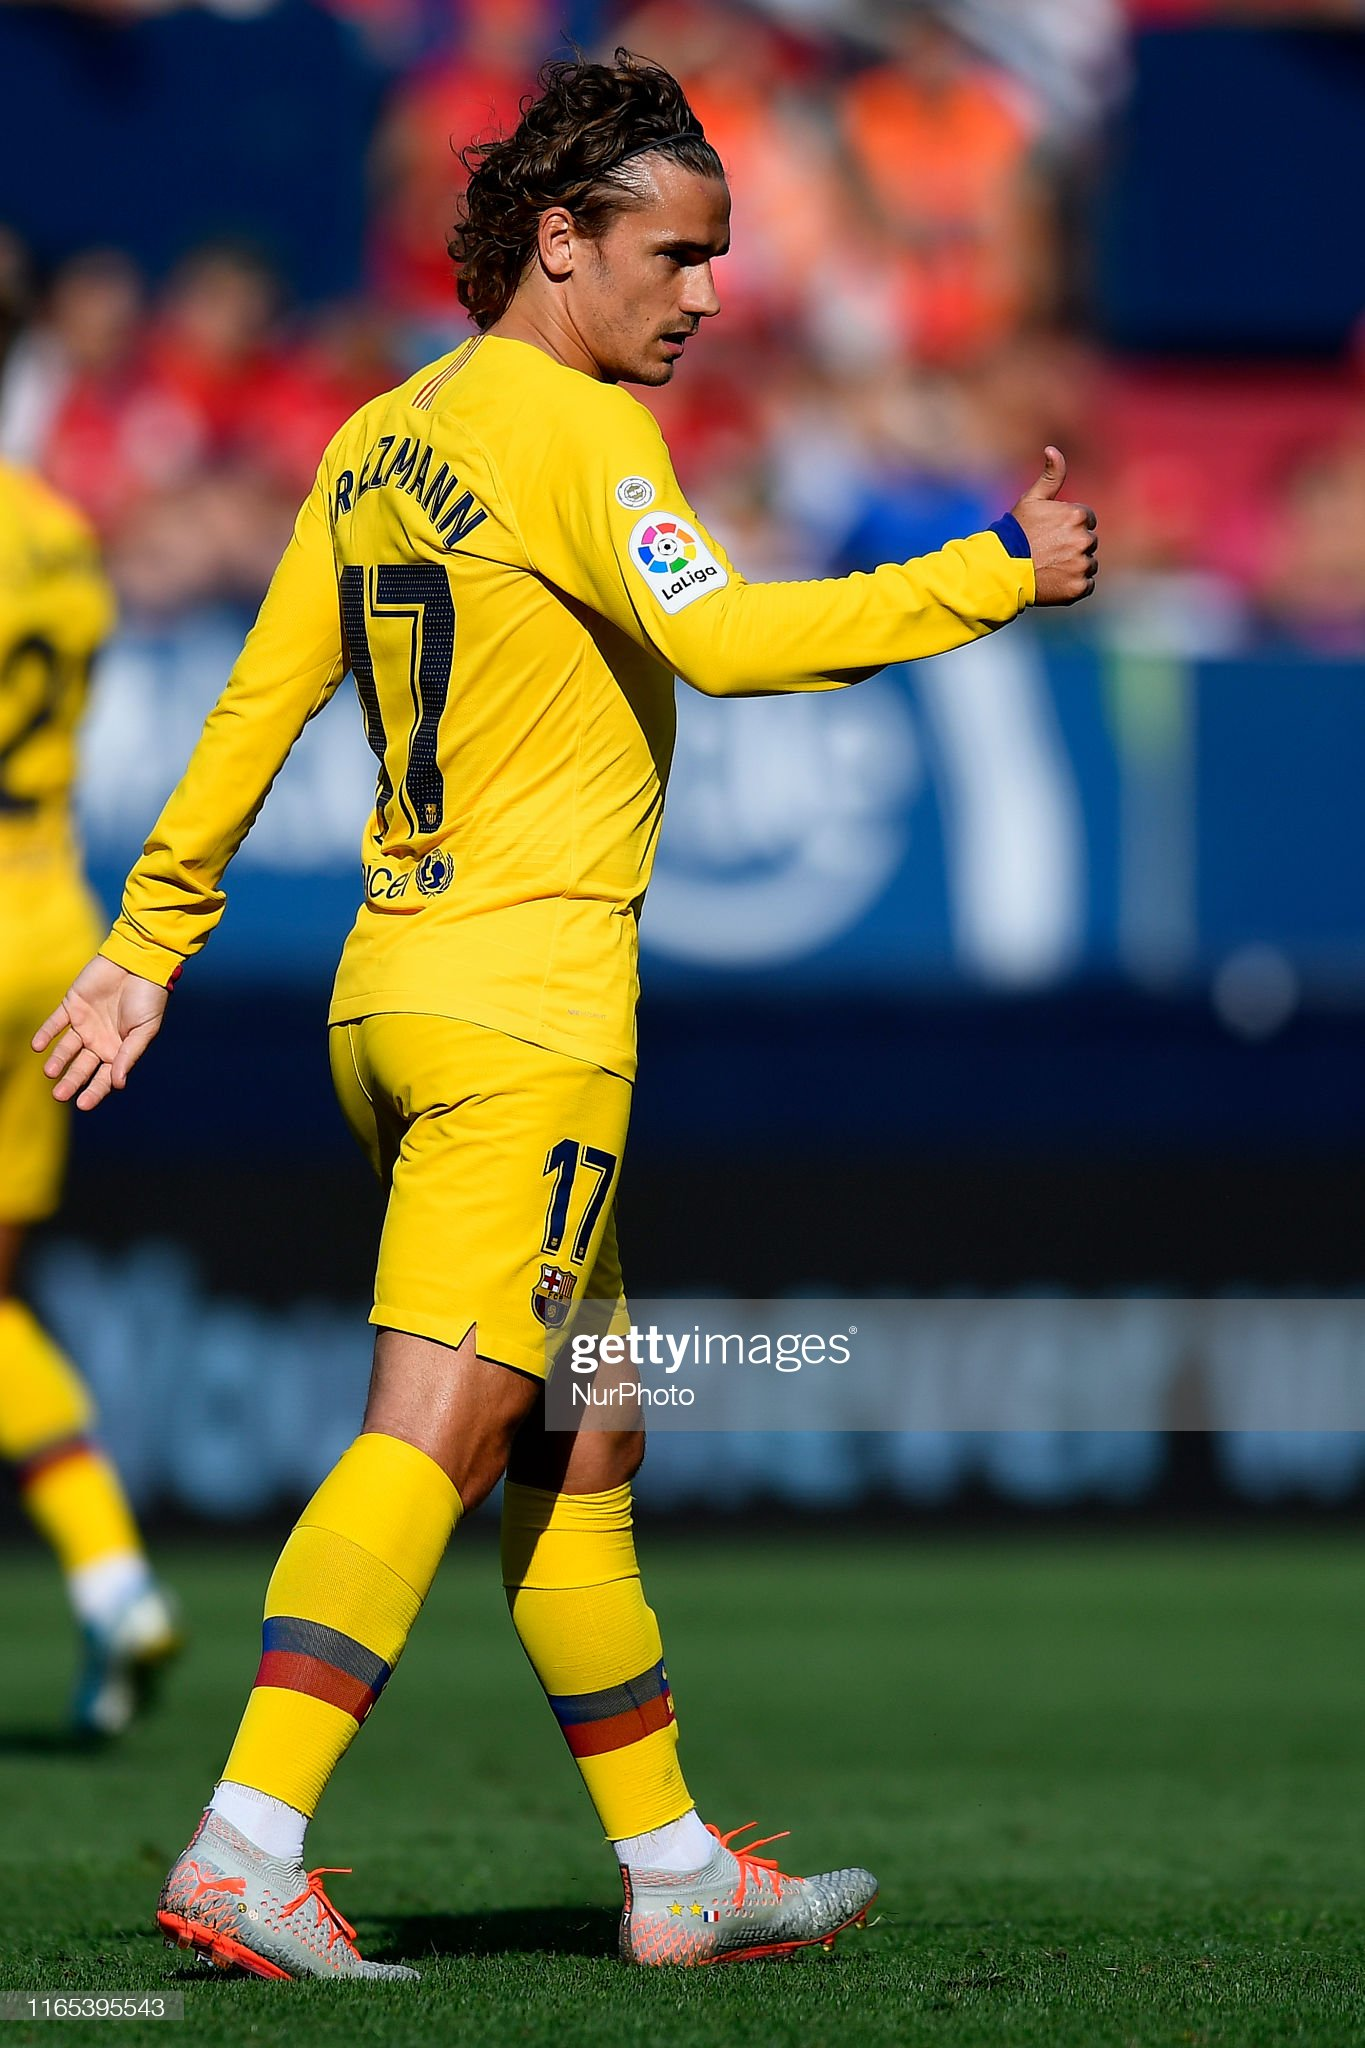 صور مباراة : أوساسونا - برشلونة 2-2 ( 31-08-2019 )  Antoine-griezmann-of-barcelona-reacts-during-the-liga-match-between-picture-id1165395543?s=2048x2048